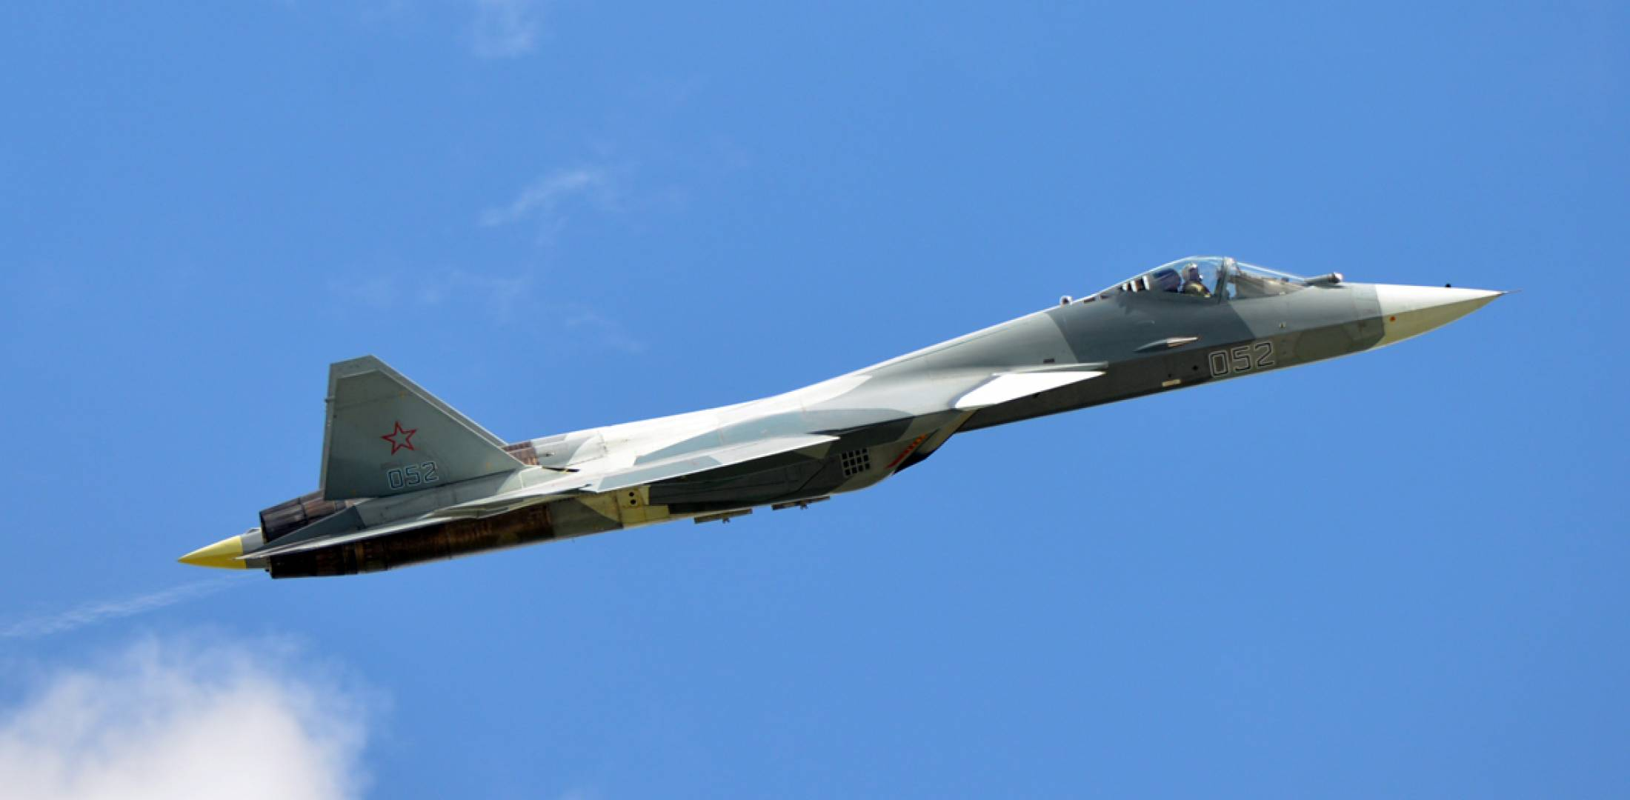 Bat chap Su-57 vua roi, Khong quan Nga van nhan mot loat tiem kich nay trong 2020-Hinh-3